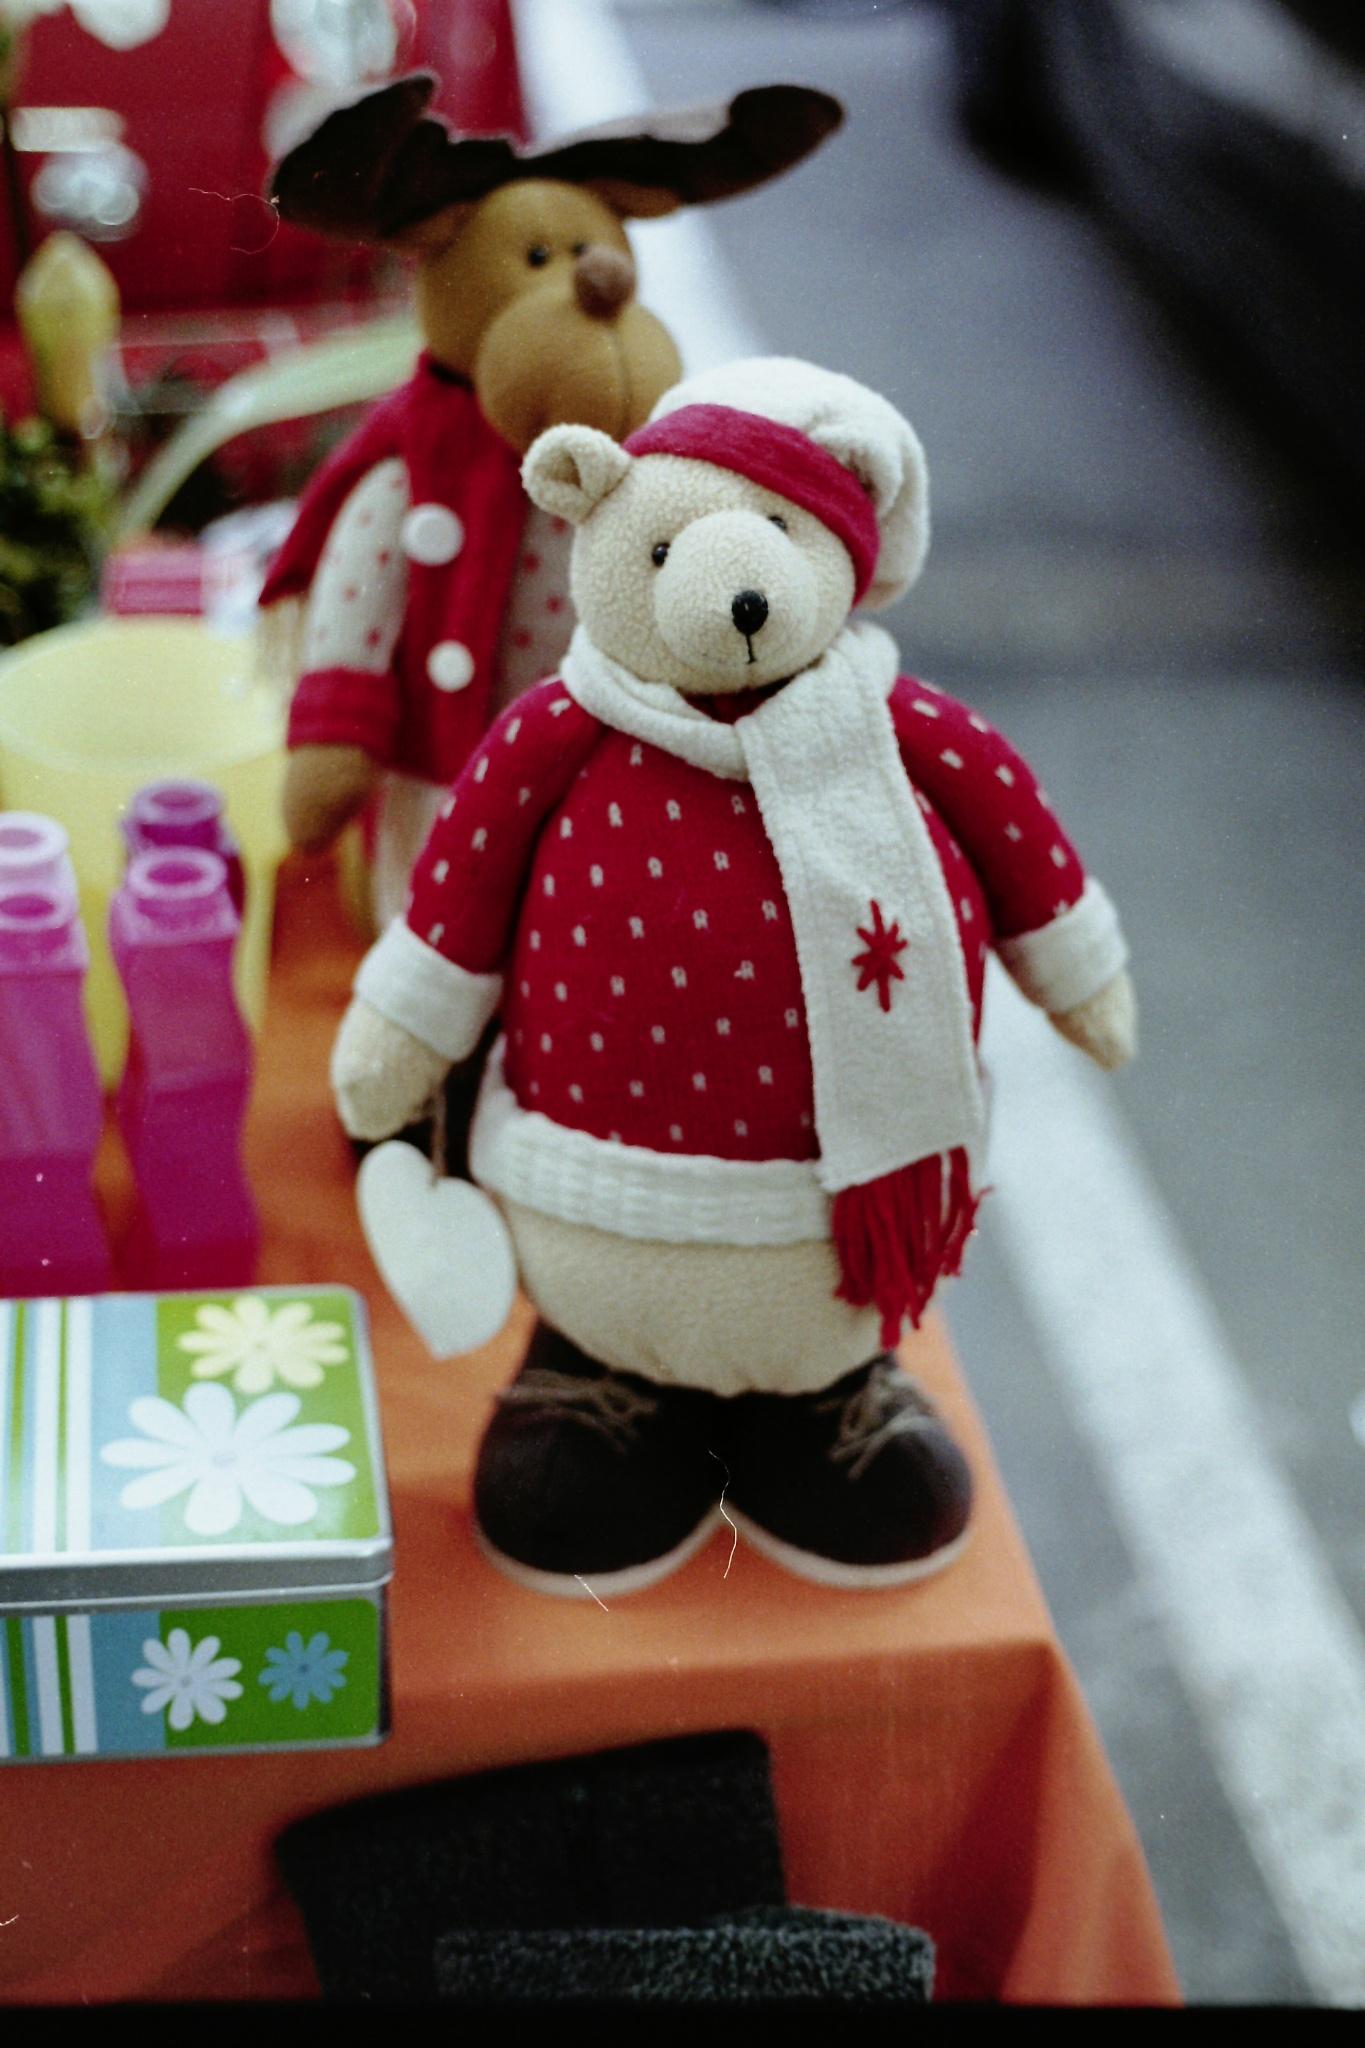 jingle bear by mapetermayer